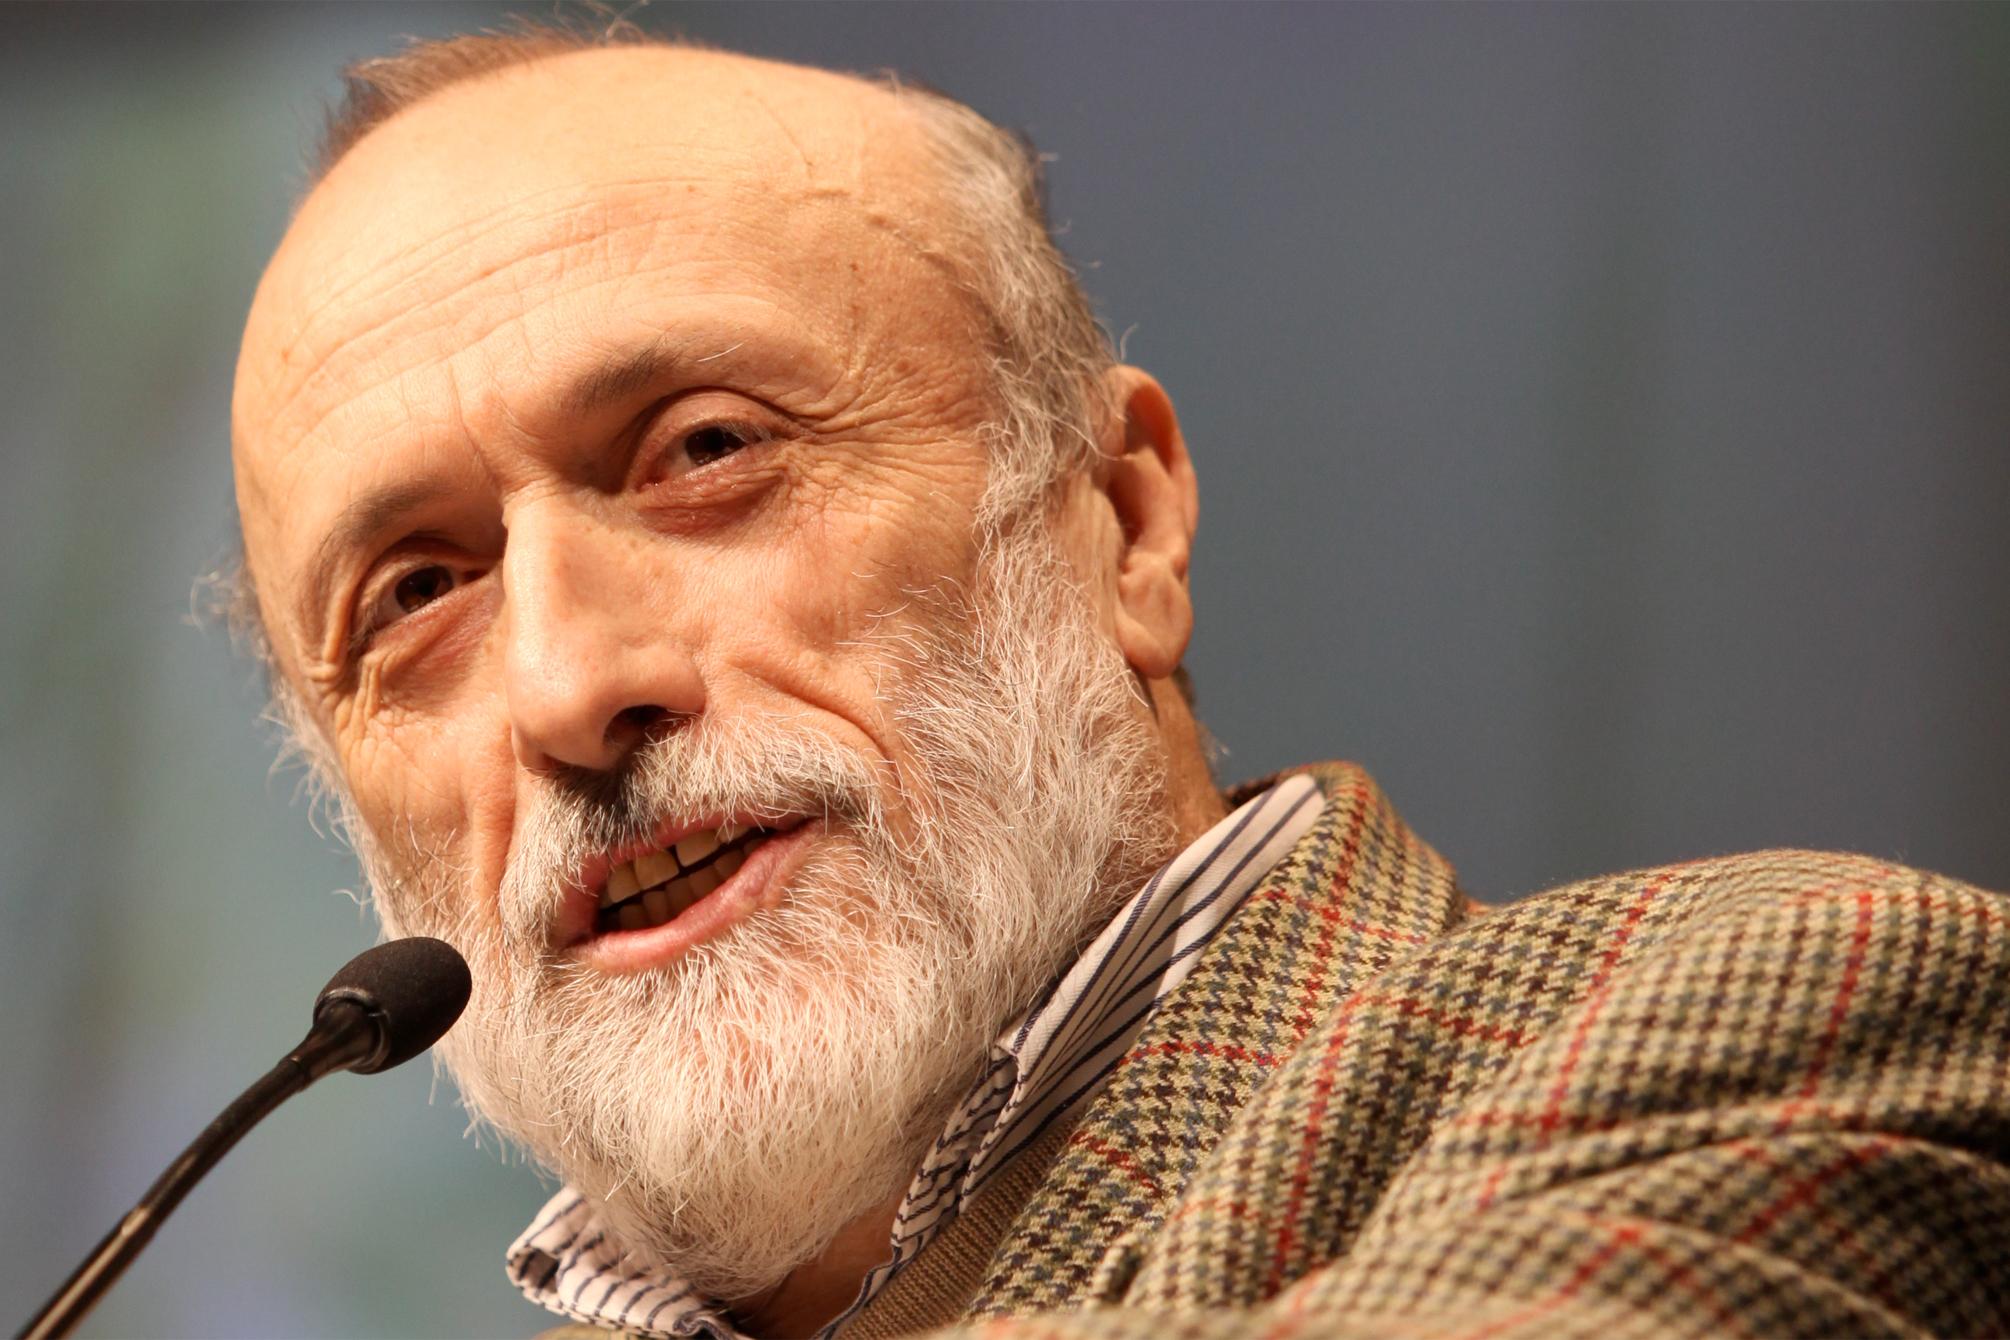 Euro-Magzin: Slow Food und Carlo Petrini